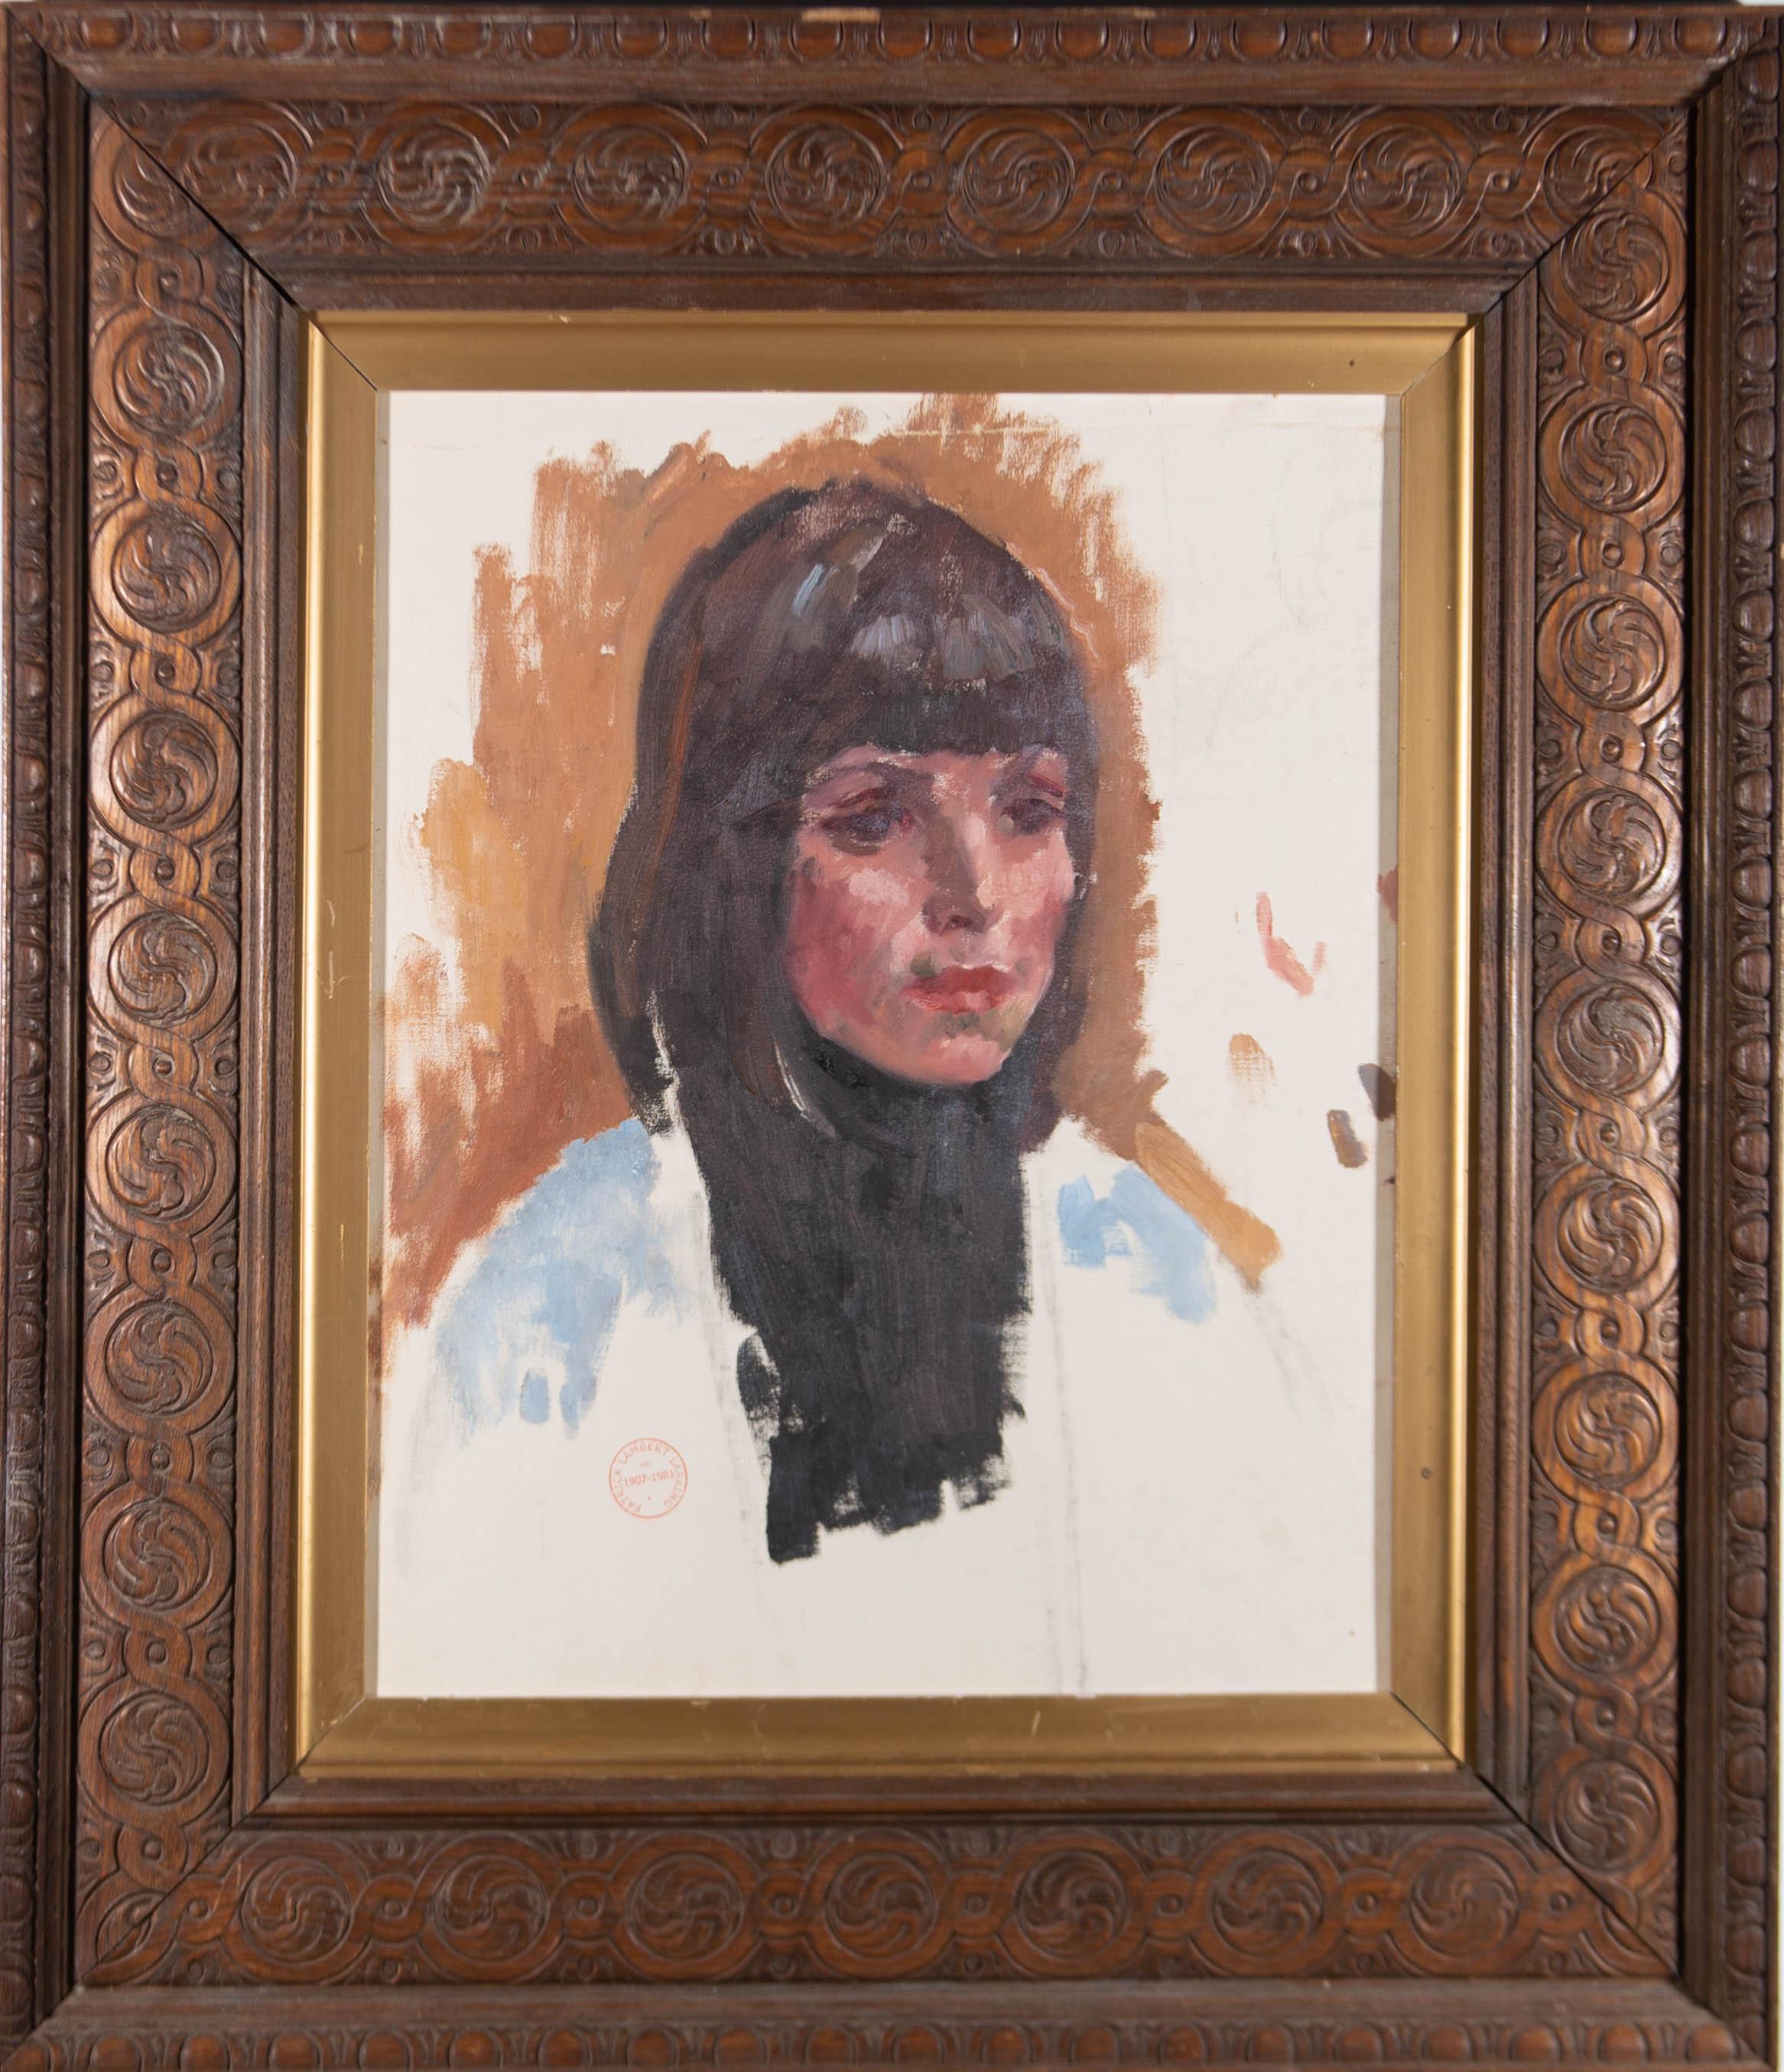 Patrick Lambert Larkin (1907-1981) - Mid 20th Century Oil, Young Woman, Study